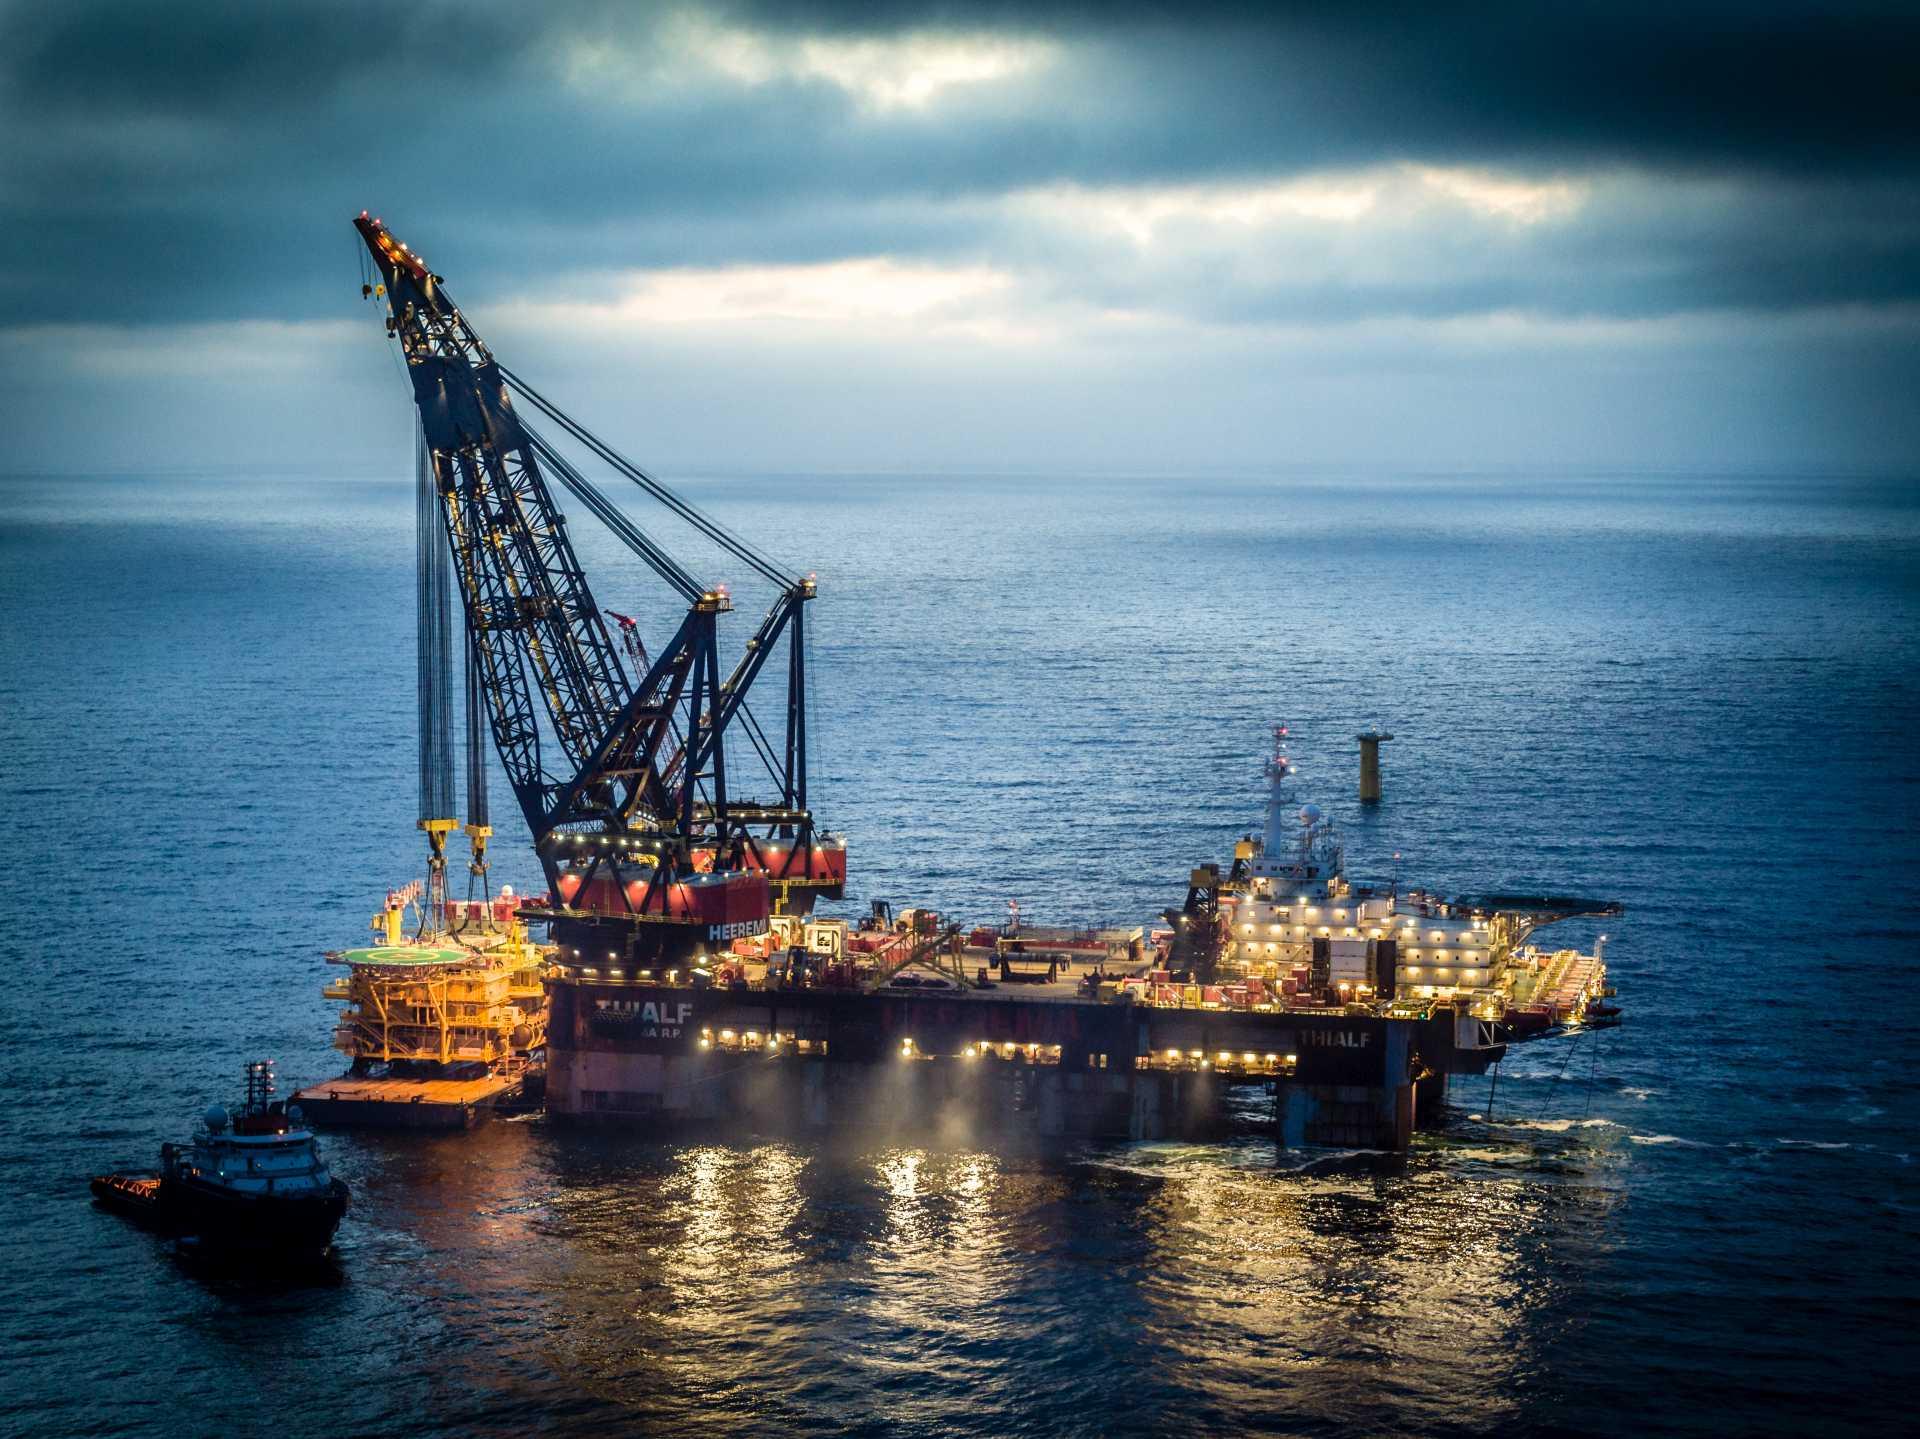 Offshore Heavy Lift Crane Hook Vessel Charter Purchase sale Brokerage Services GRS